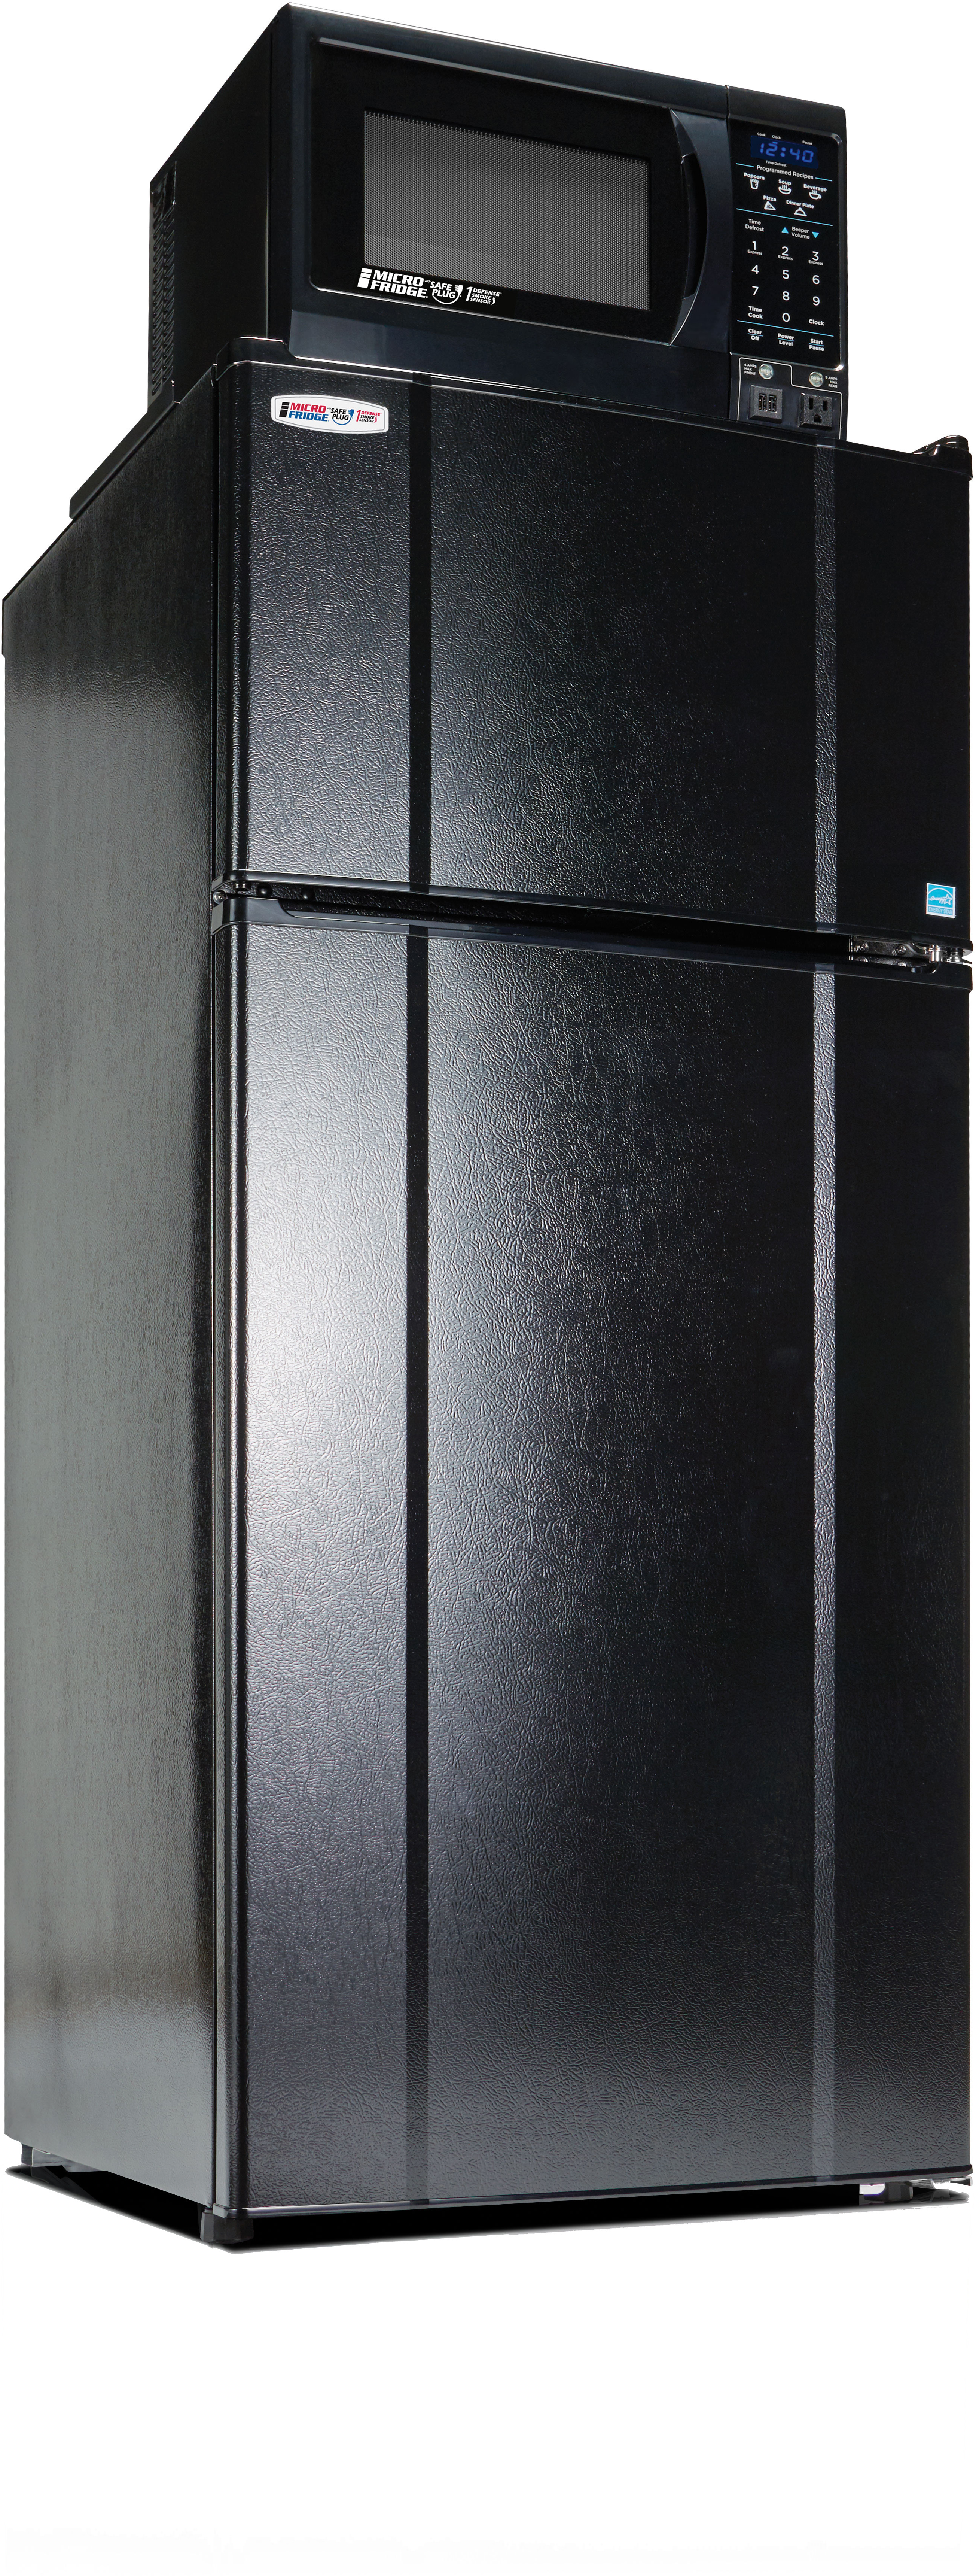 MicroFridge Refrigerator 103LMF49D1